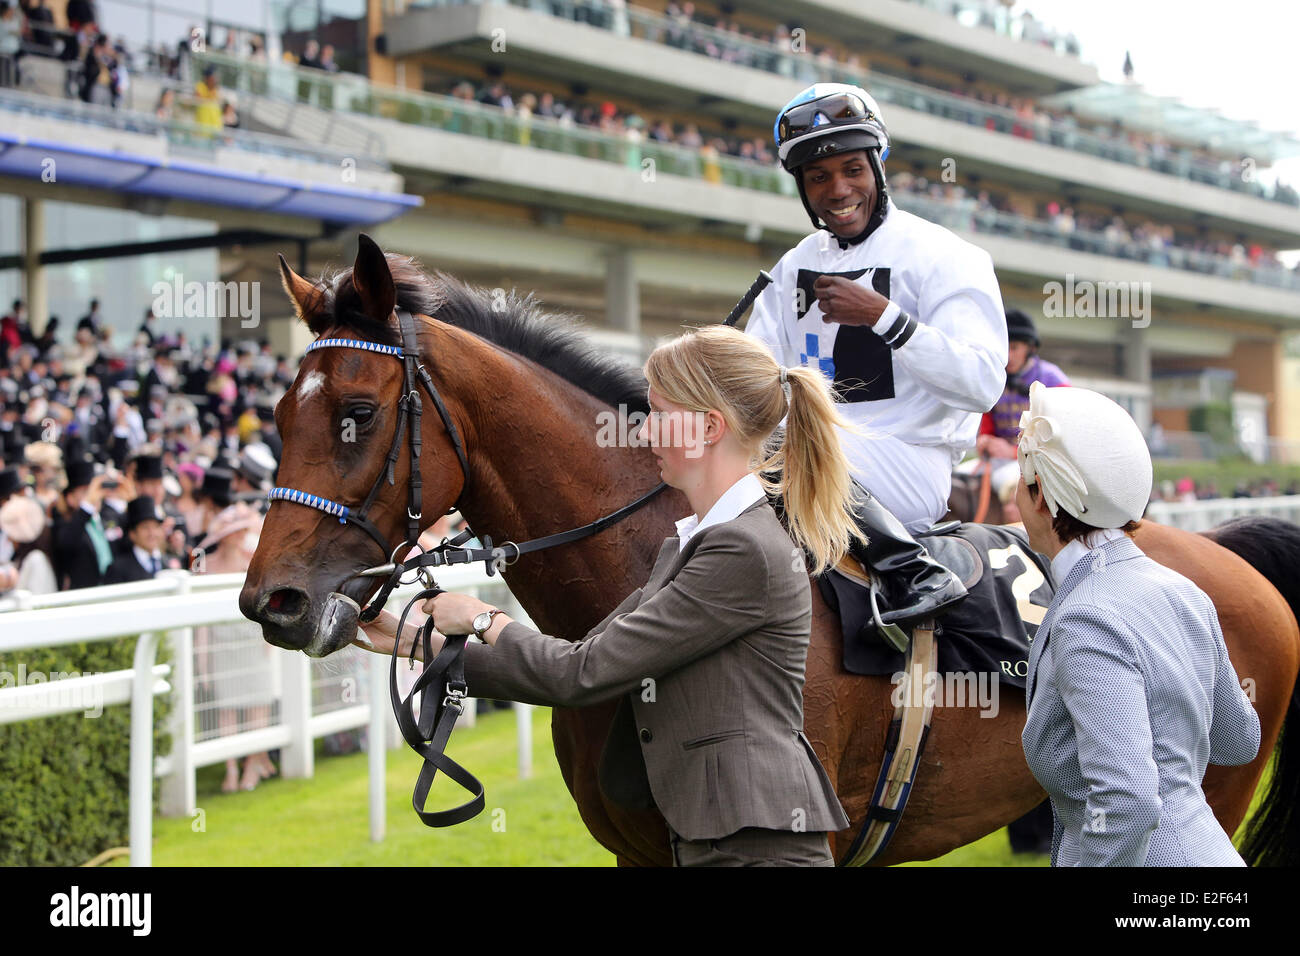 Ascot, Berkshire, UK. 19th June, 2014.  Altano with Eduardo Pedroza up. Ascot racecourse. (Pferd, Jockey, Altano, Stock Photo